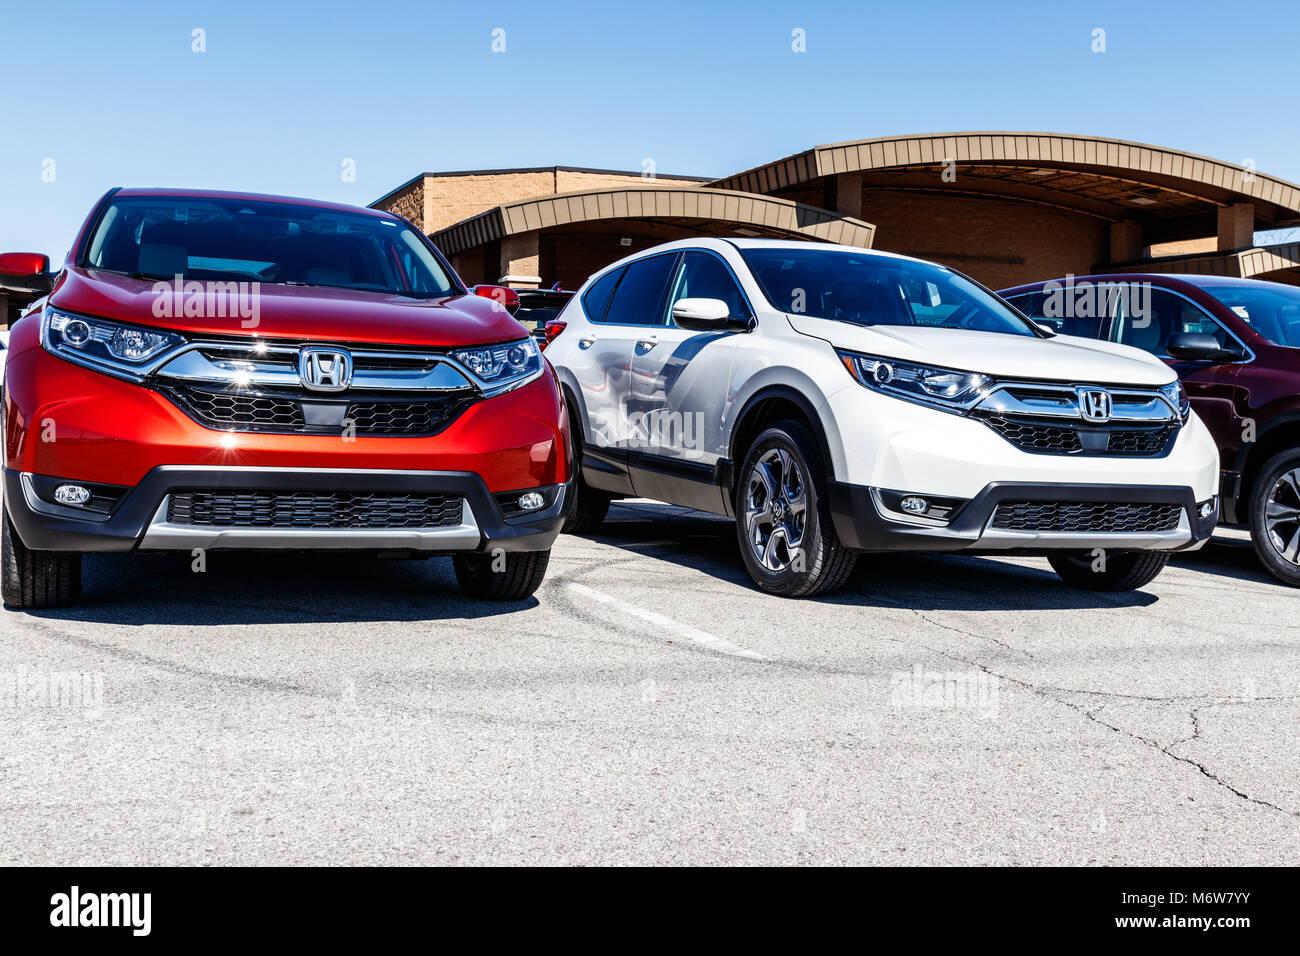 Honda cr v stock photos honda cr v stock images alamy for Honda motor company stock